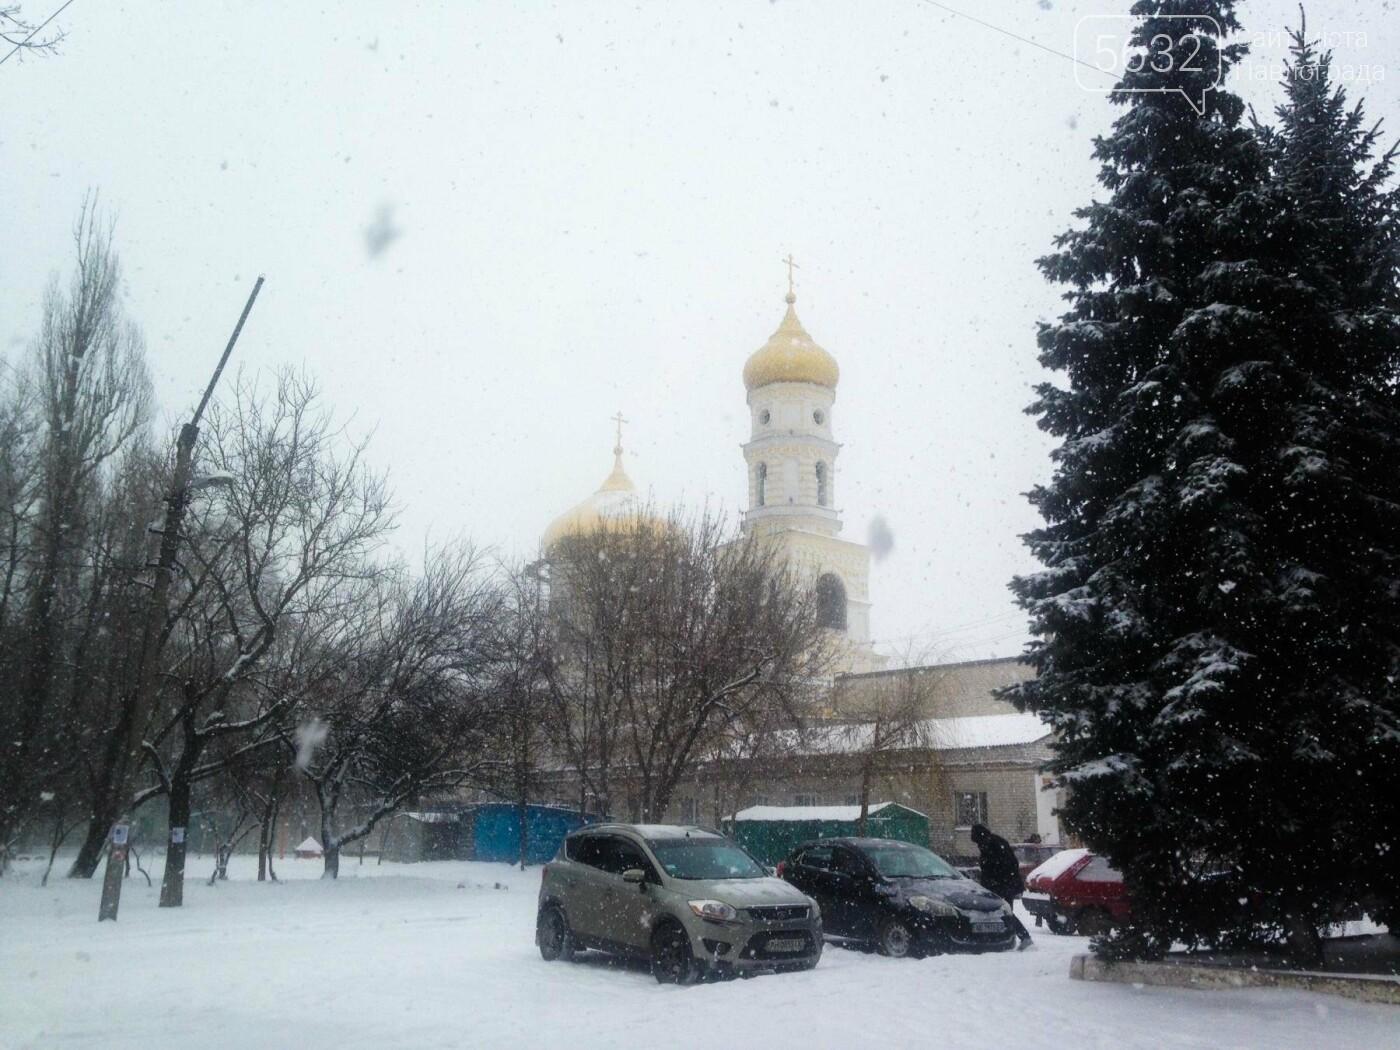 В Павлоград пришла зима: город накрыло снегом, фото-4